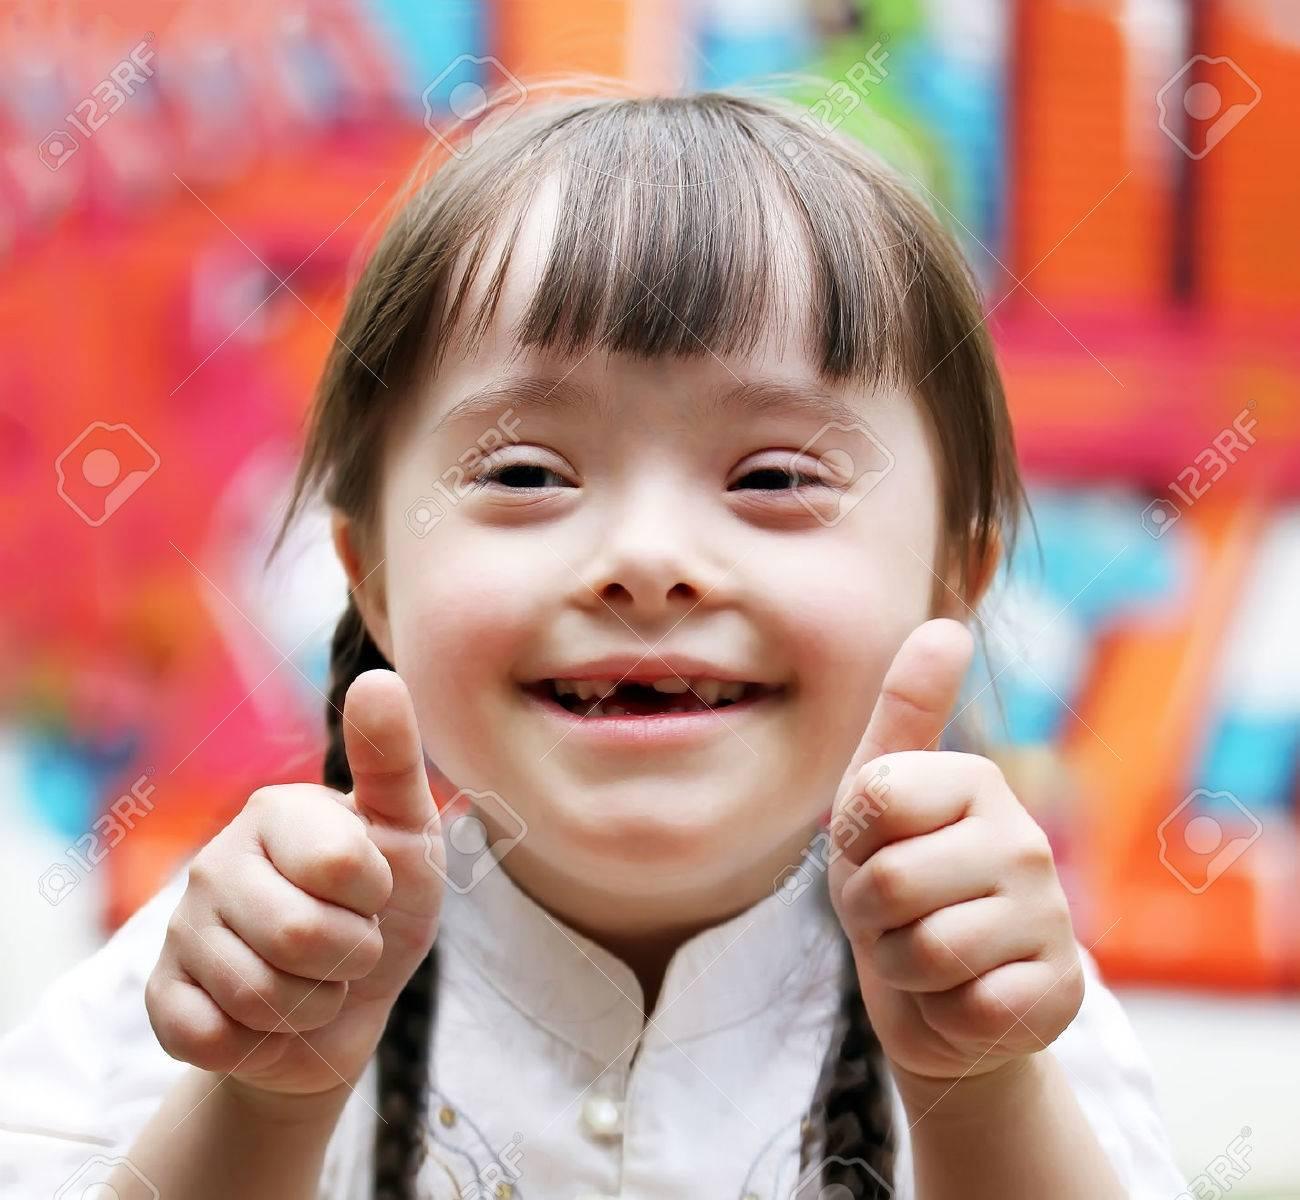 Portrait of beautiful happy girl giving thumbs up. Standard-Bild - 67080090